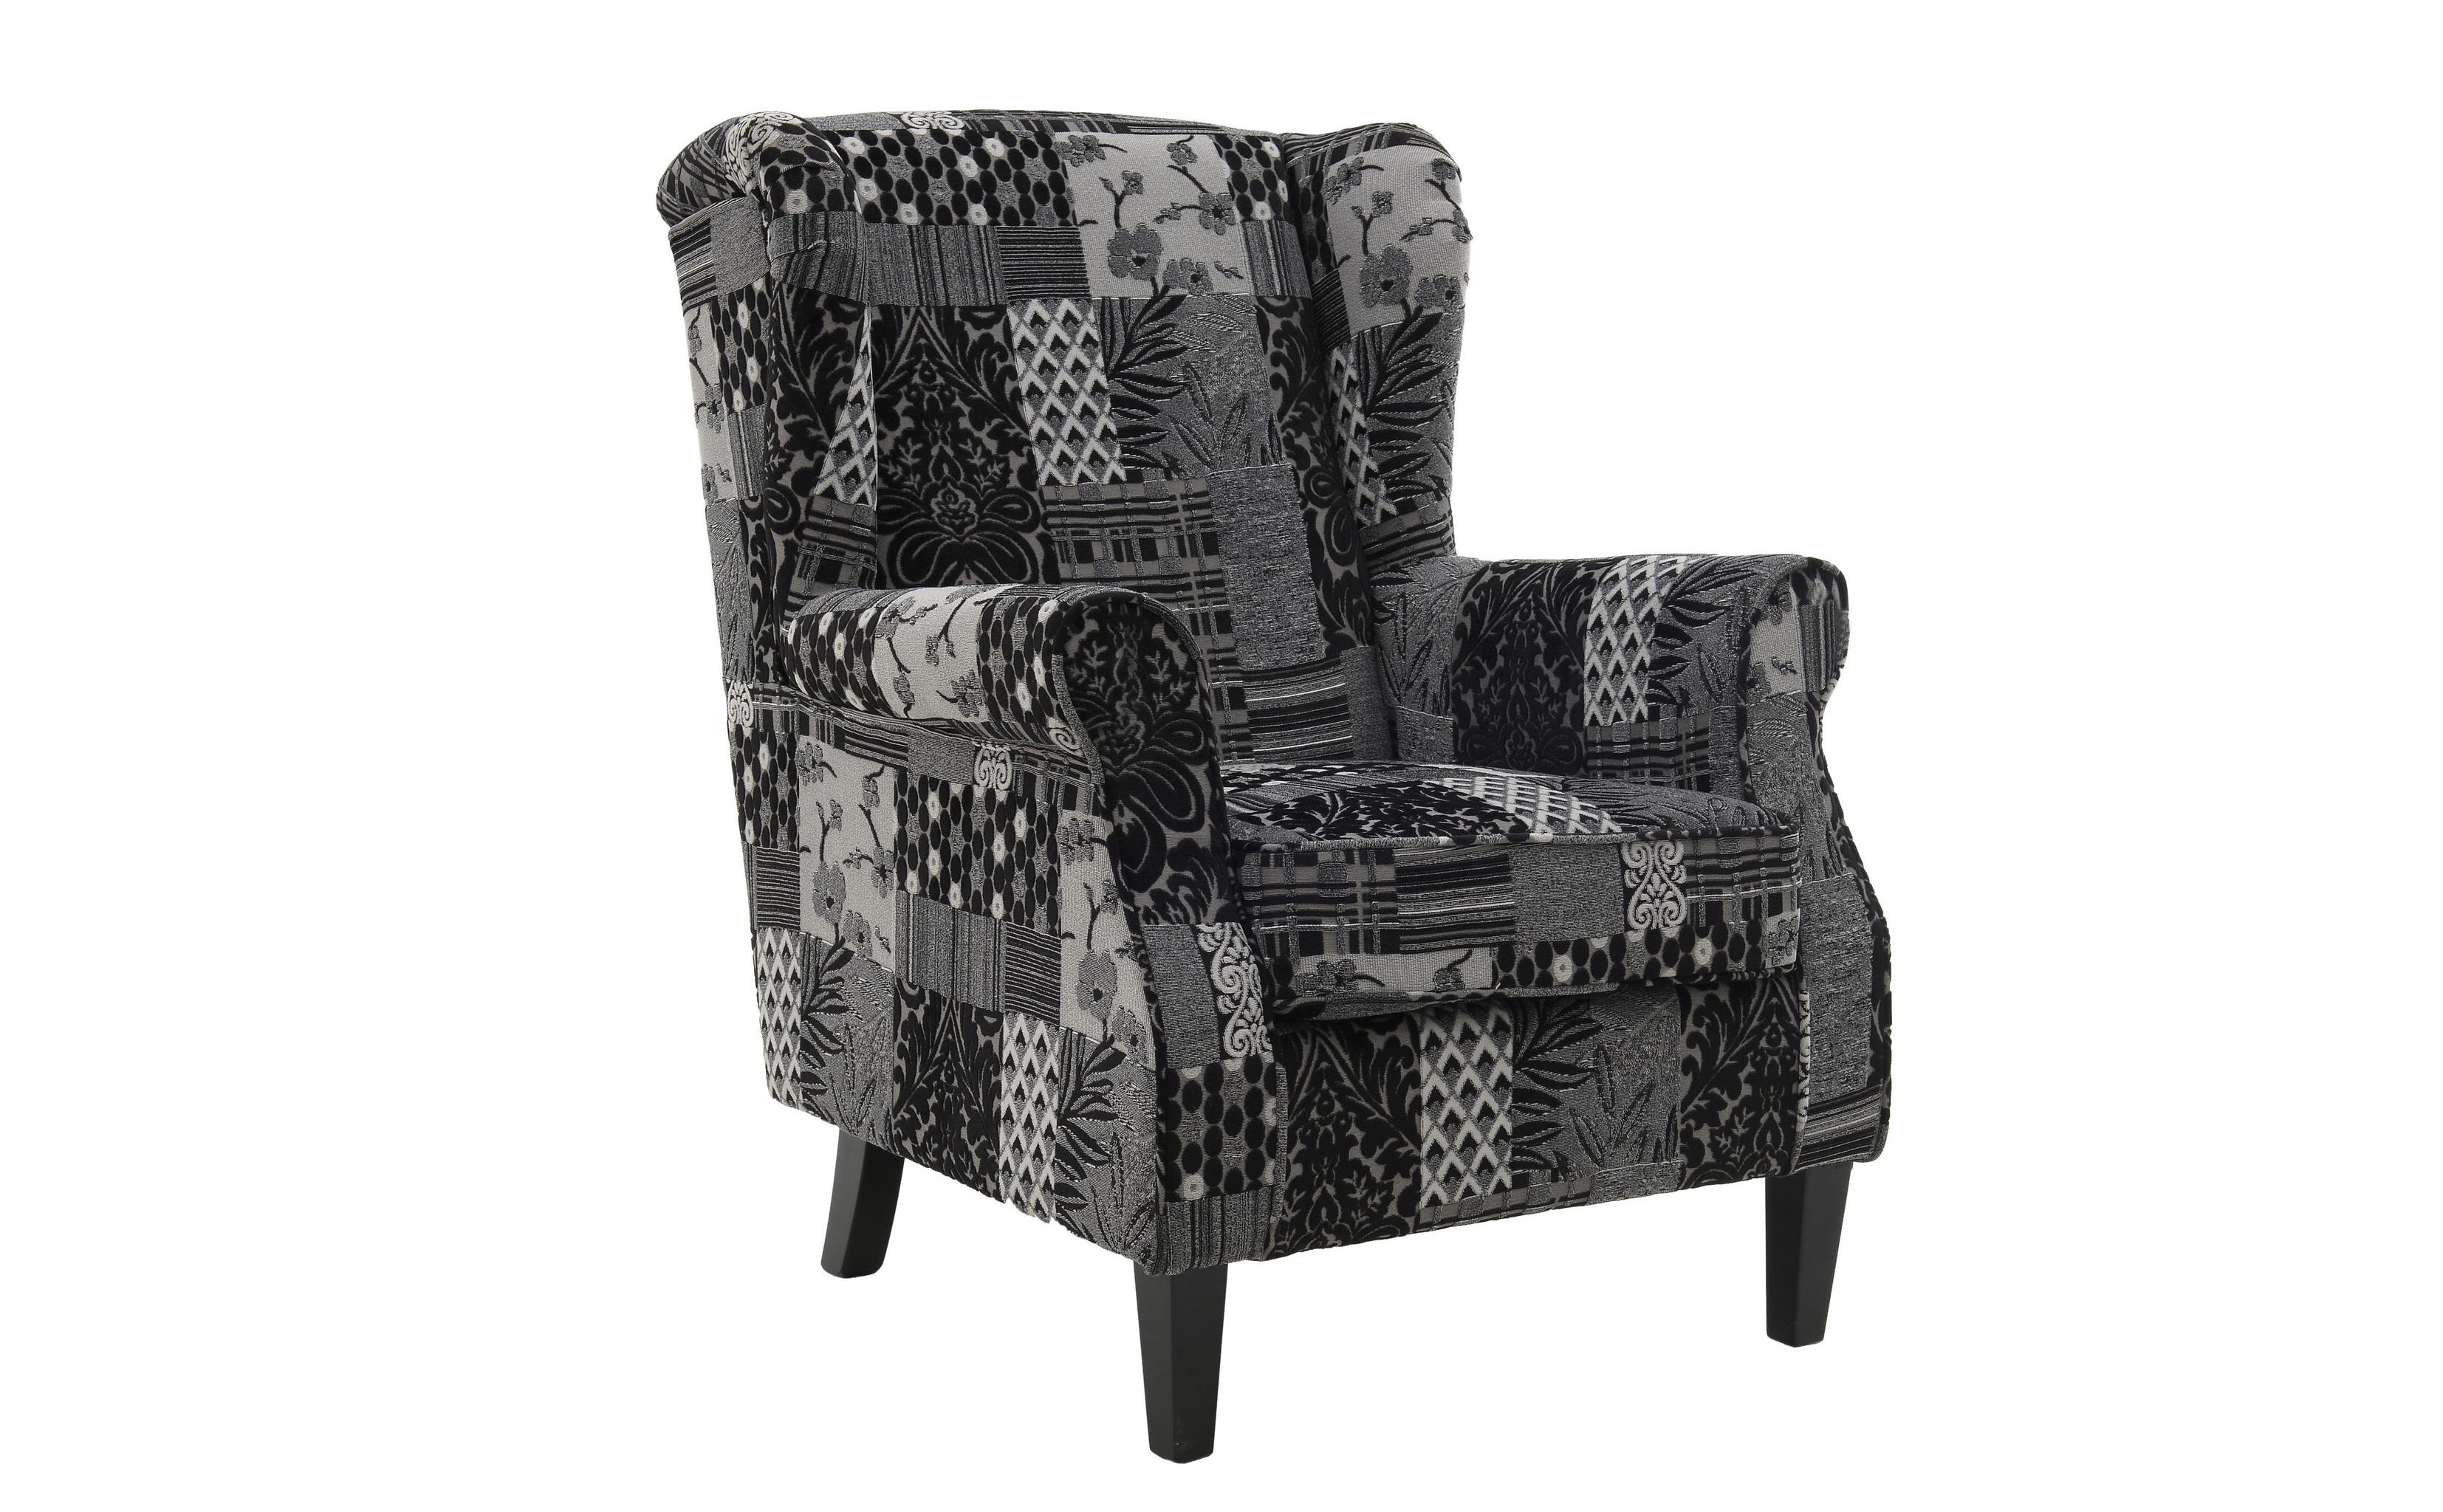 Кресло Mart?nezИнтерьерные кресла<br>Материал: дерево, хлопок, полиэстер<br><br>kit: None<br>gender: None